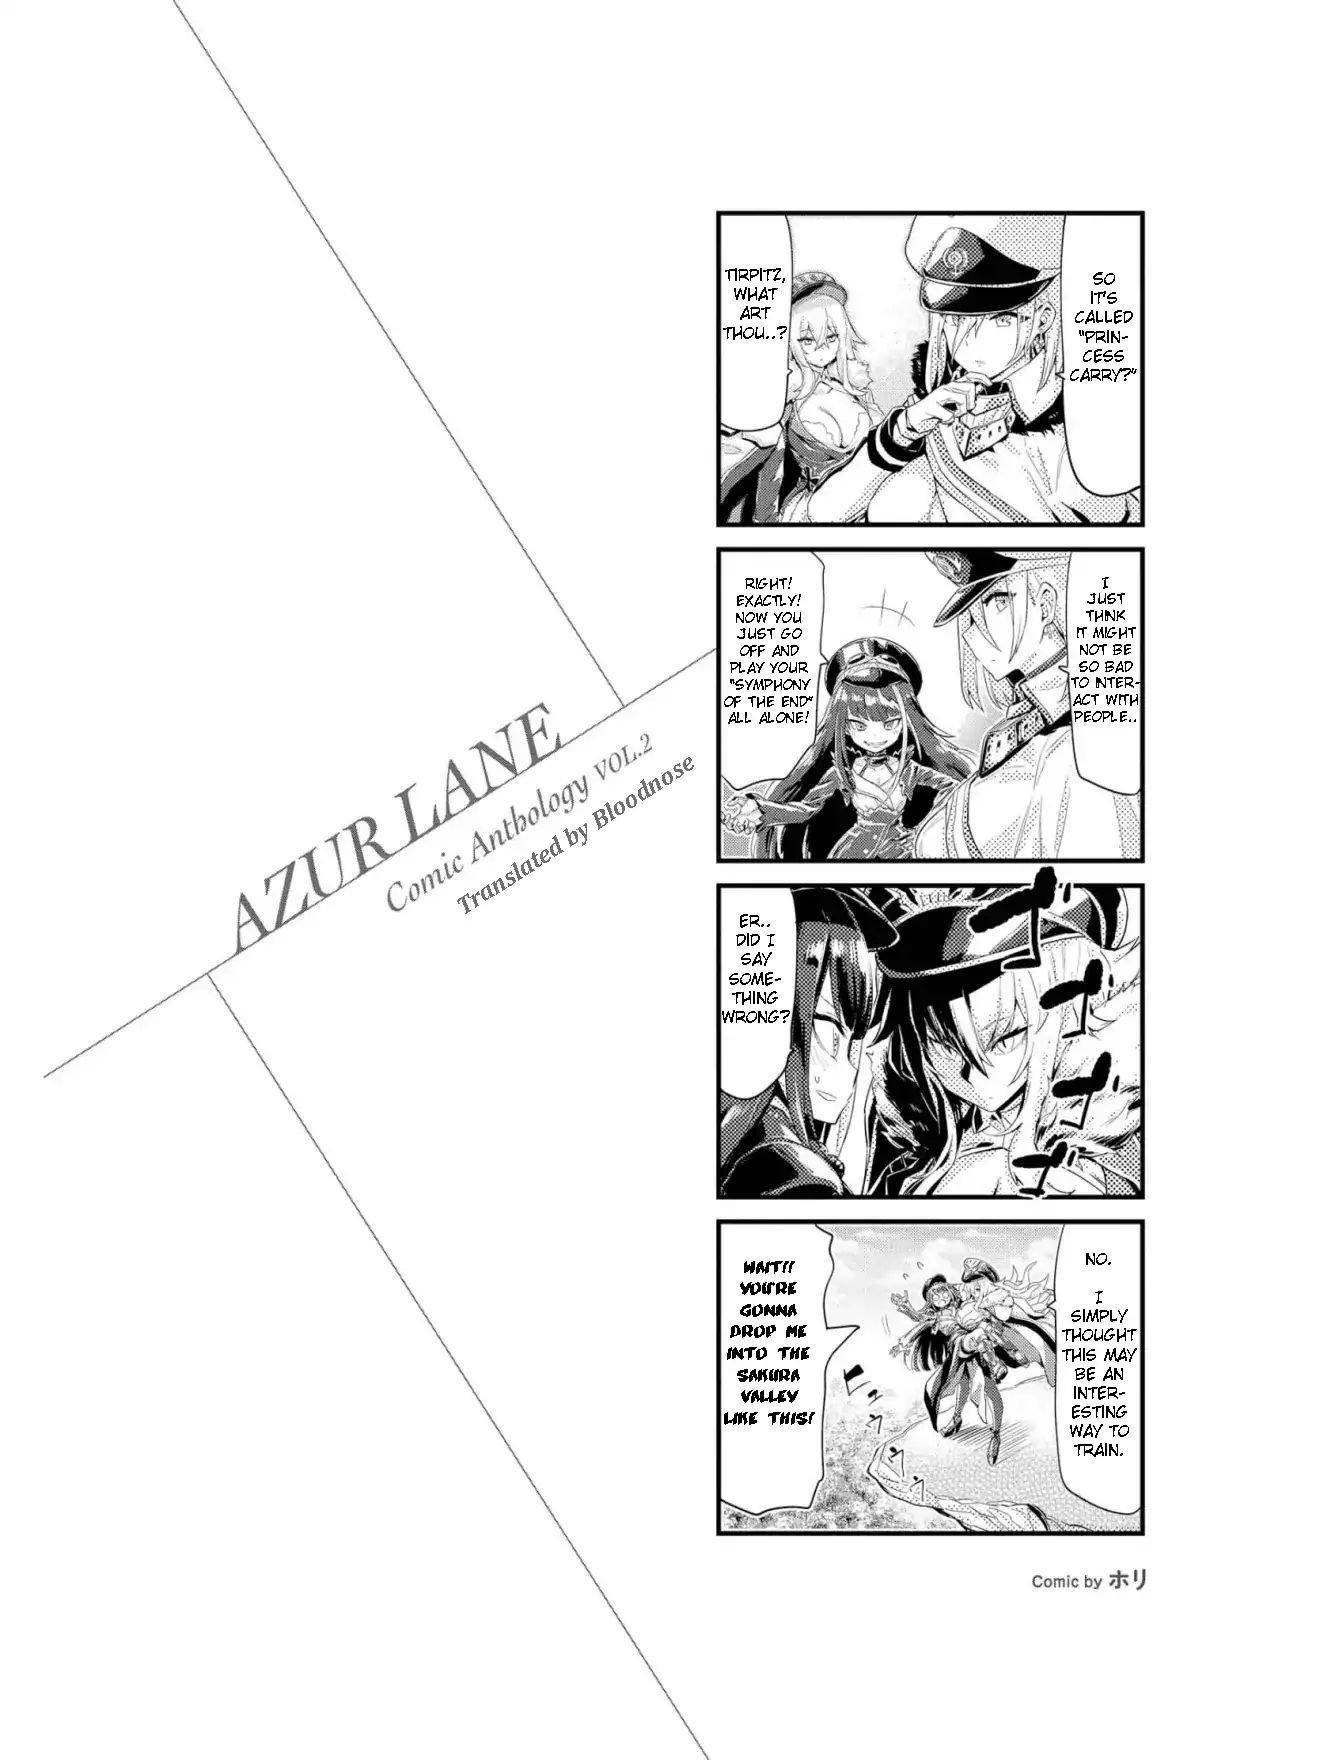 Manga Azur Lane Comic Anthology - Chapter 19 Page 2